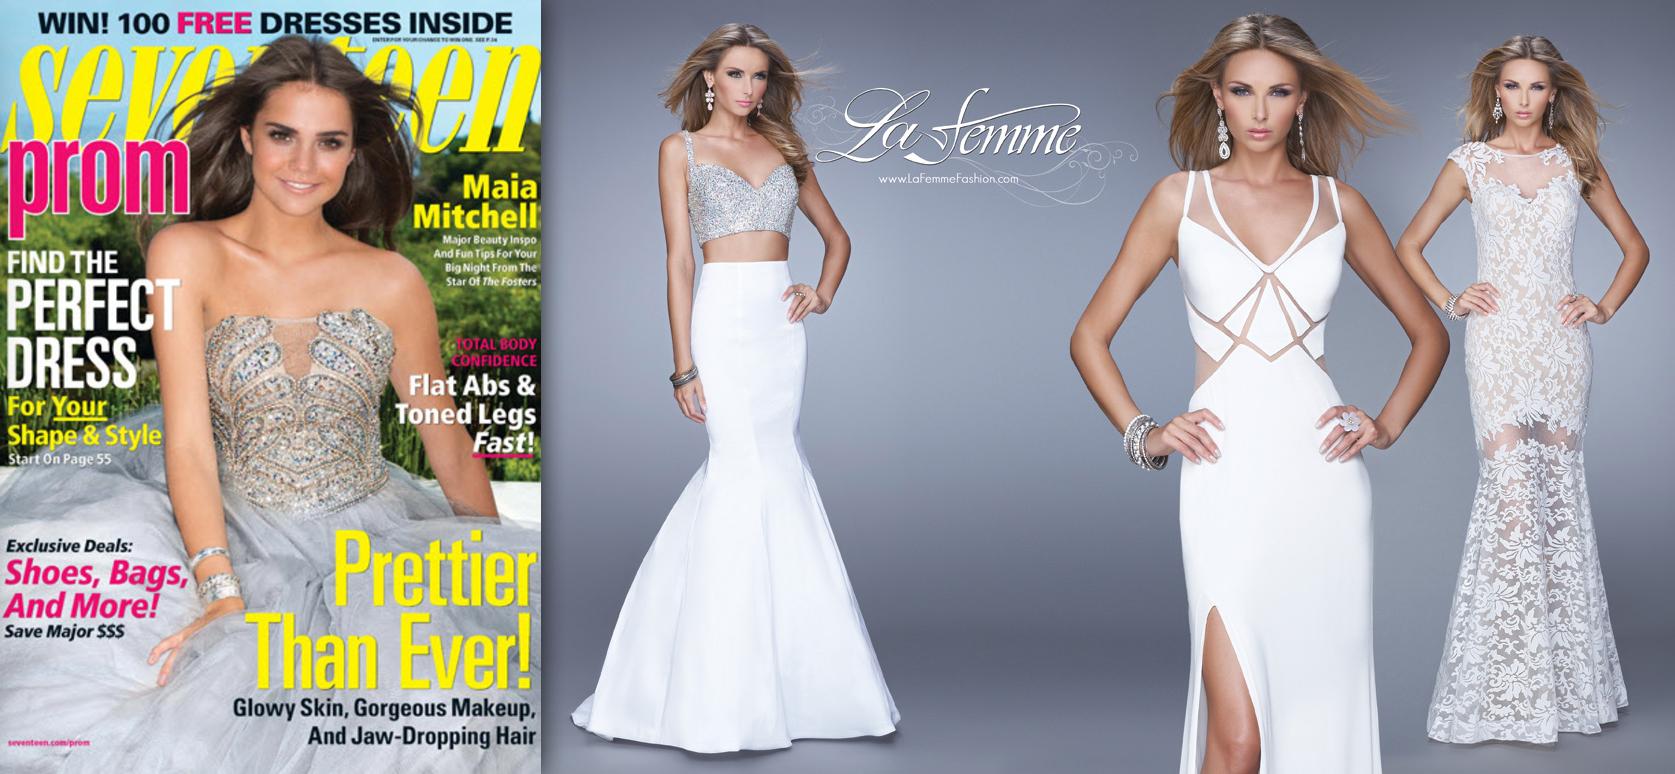 "Seventeen Magazine: Prom 2015 ""La Femme"""